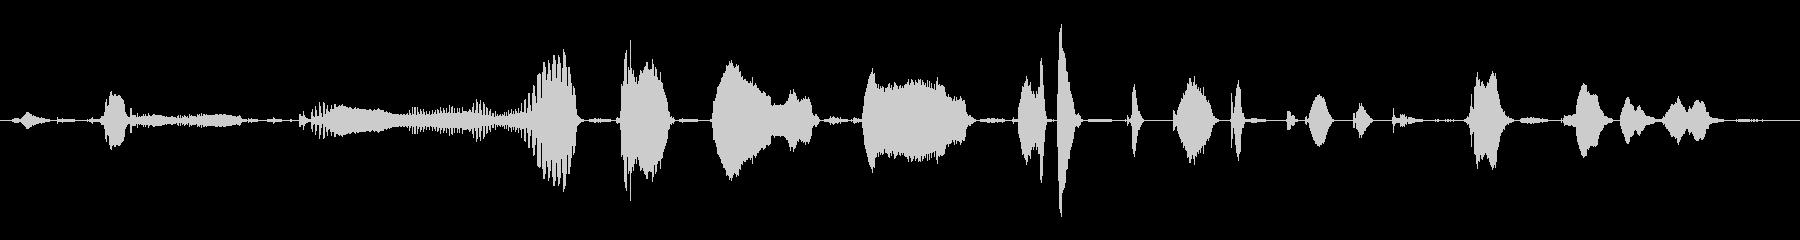 Baby E:幸せな発声の未再生の波形